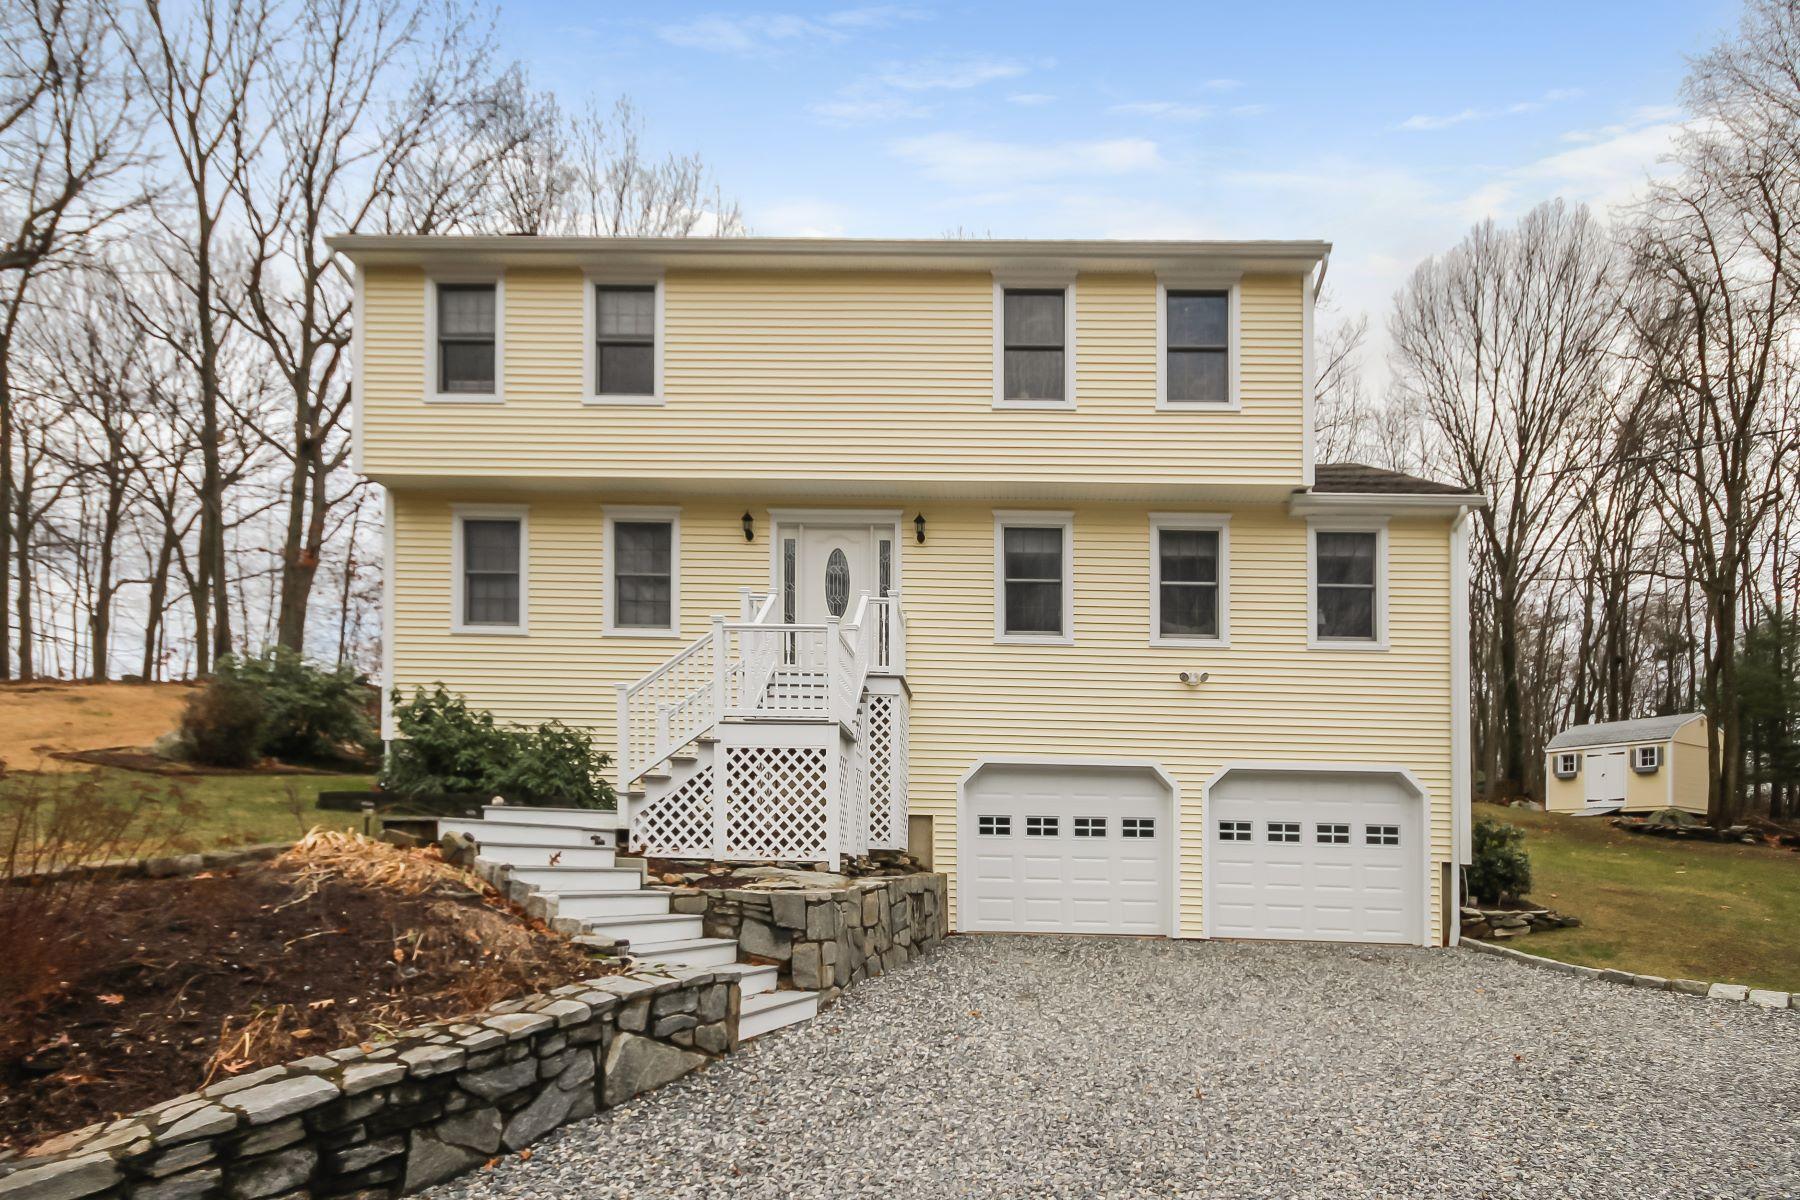 Casa Unifamiliar por un Venta en Pride of Ownership Abounds 65 Morning Glory Terr Stratford, Connecticut 06614 Estados Unidos